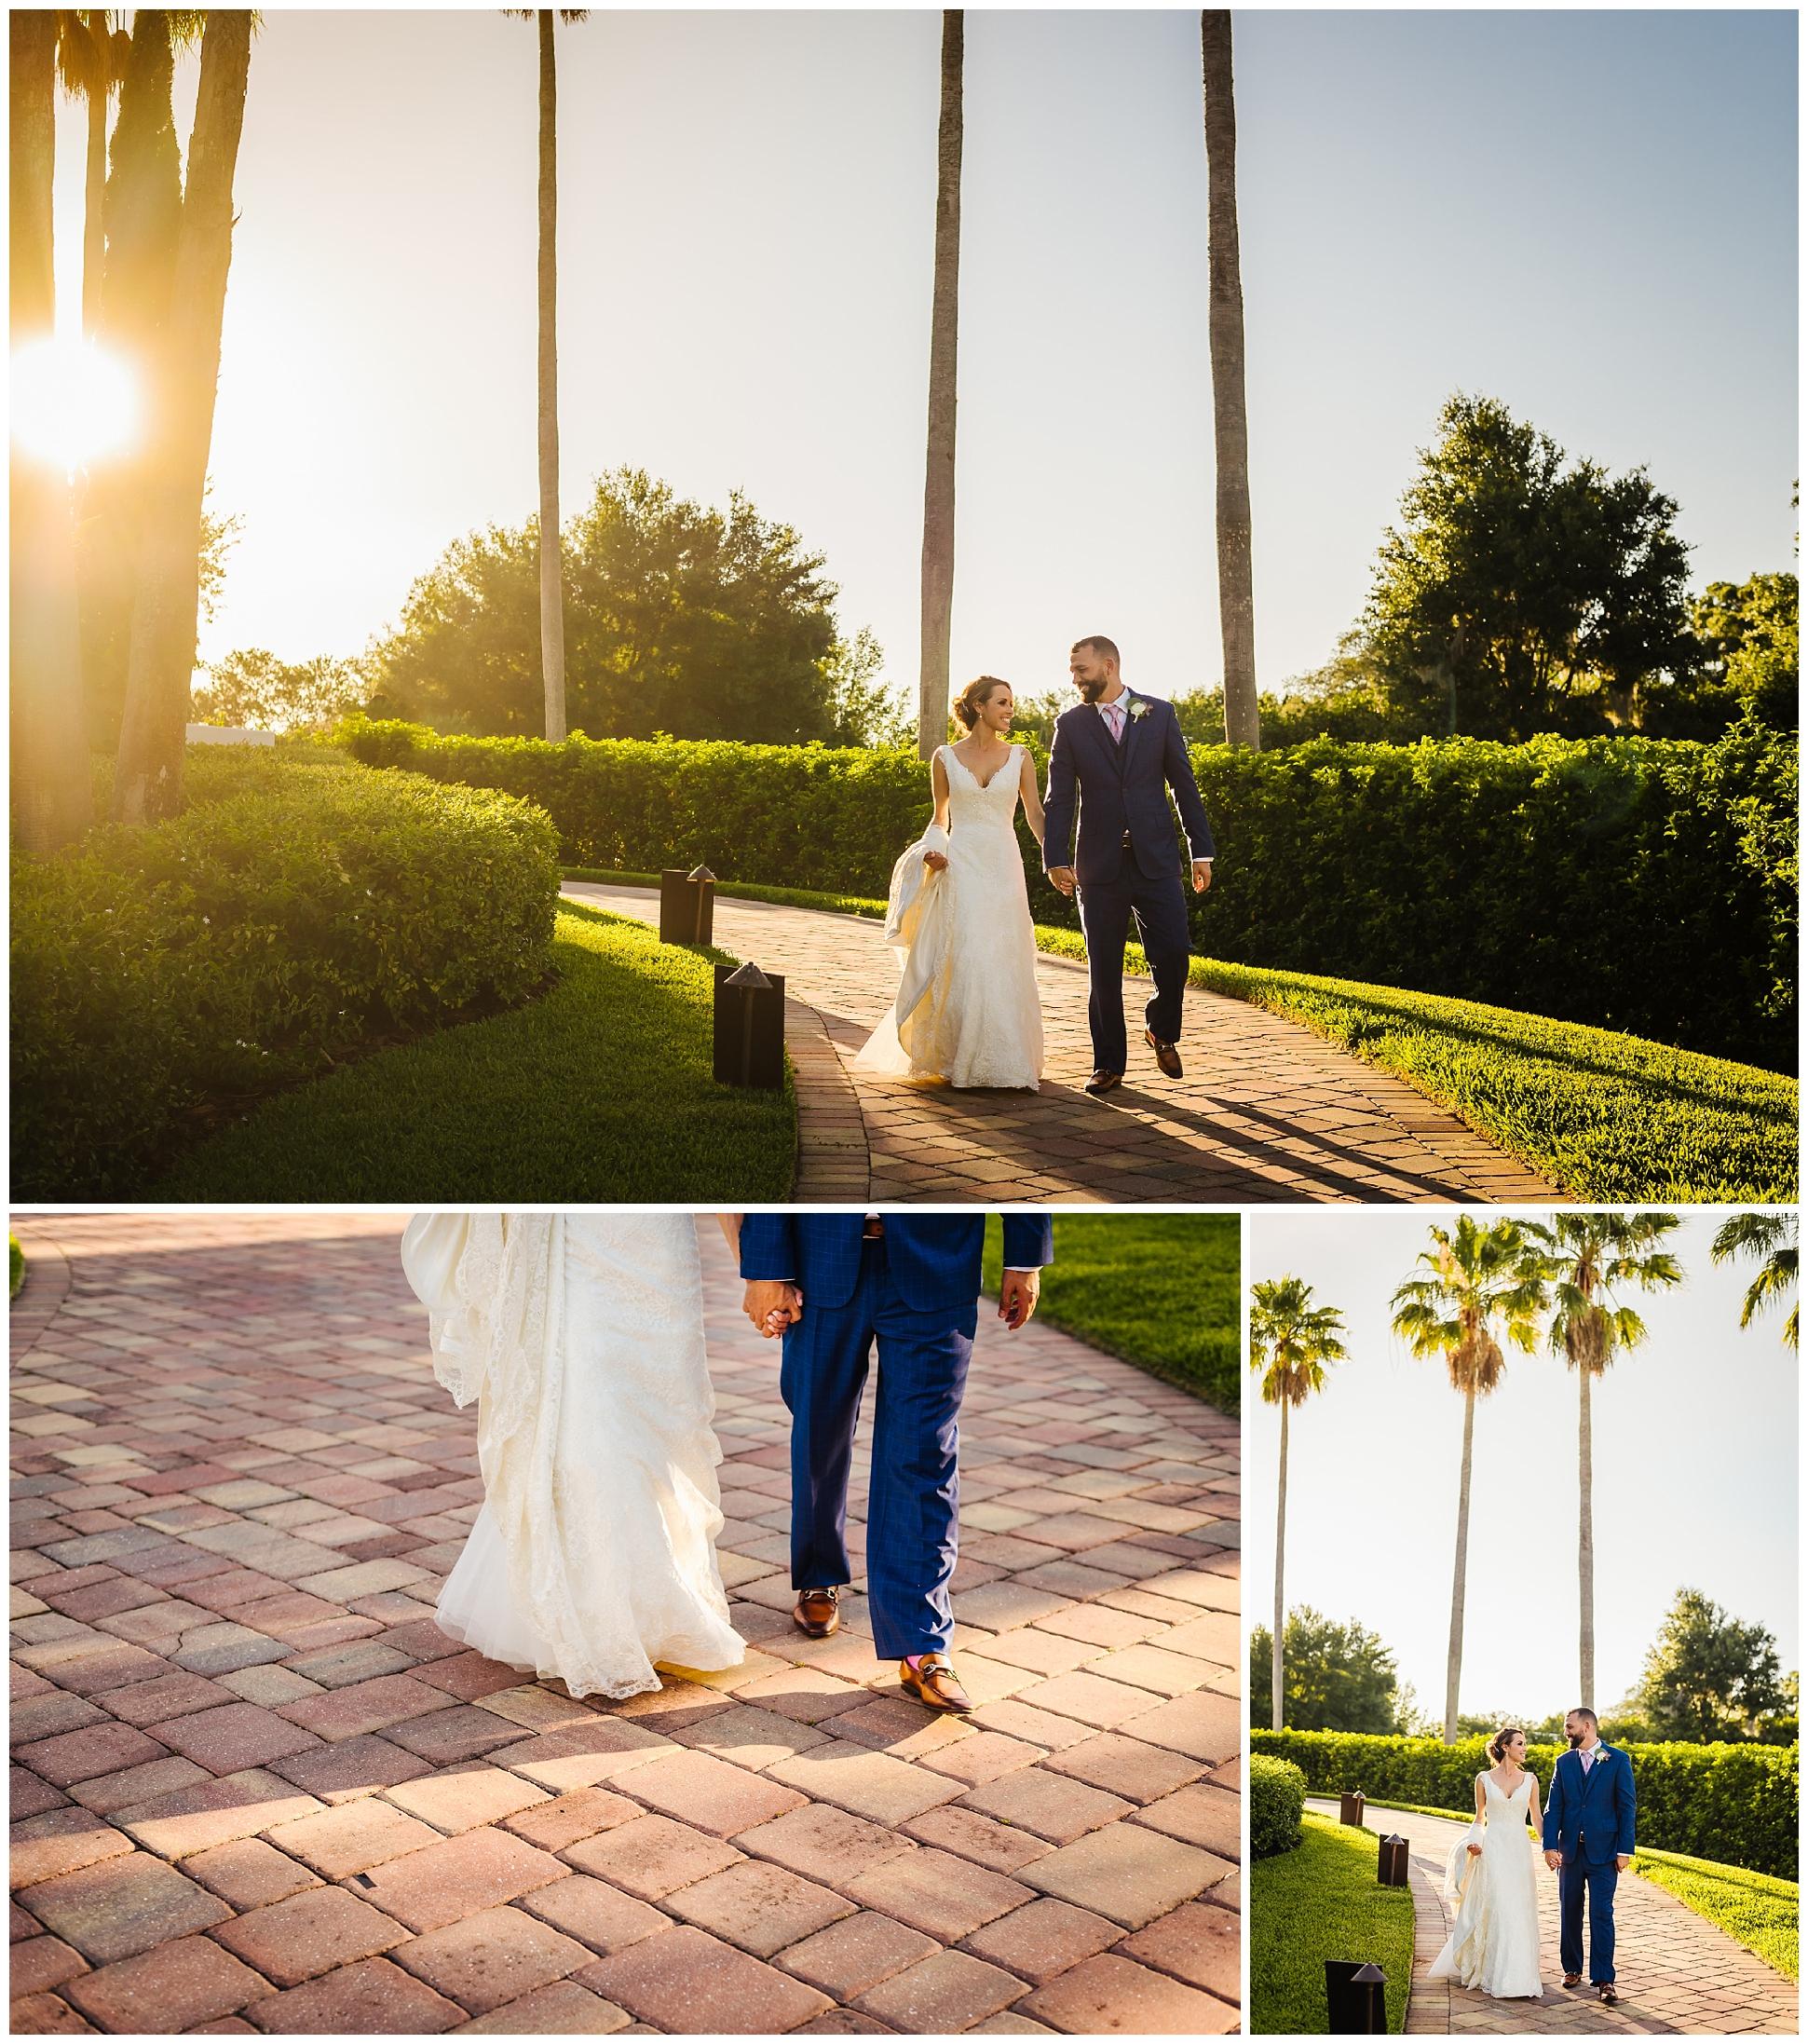 Tampa-luxury-wedding-photographer-mision-lago-private-estate_0044.jpg